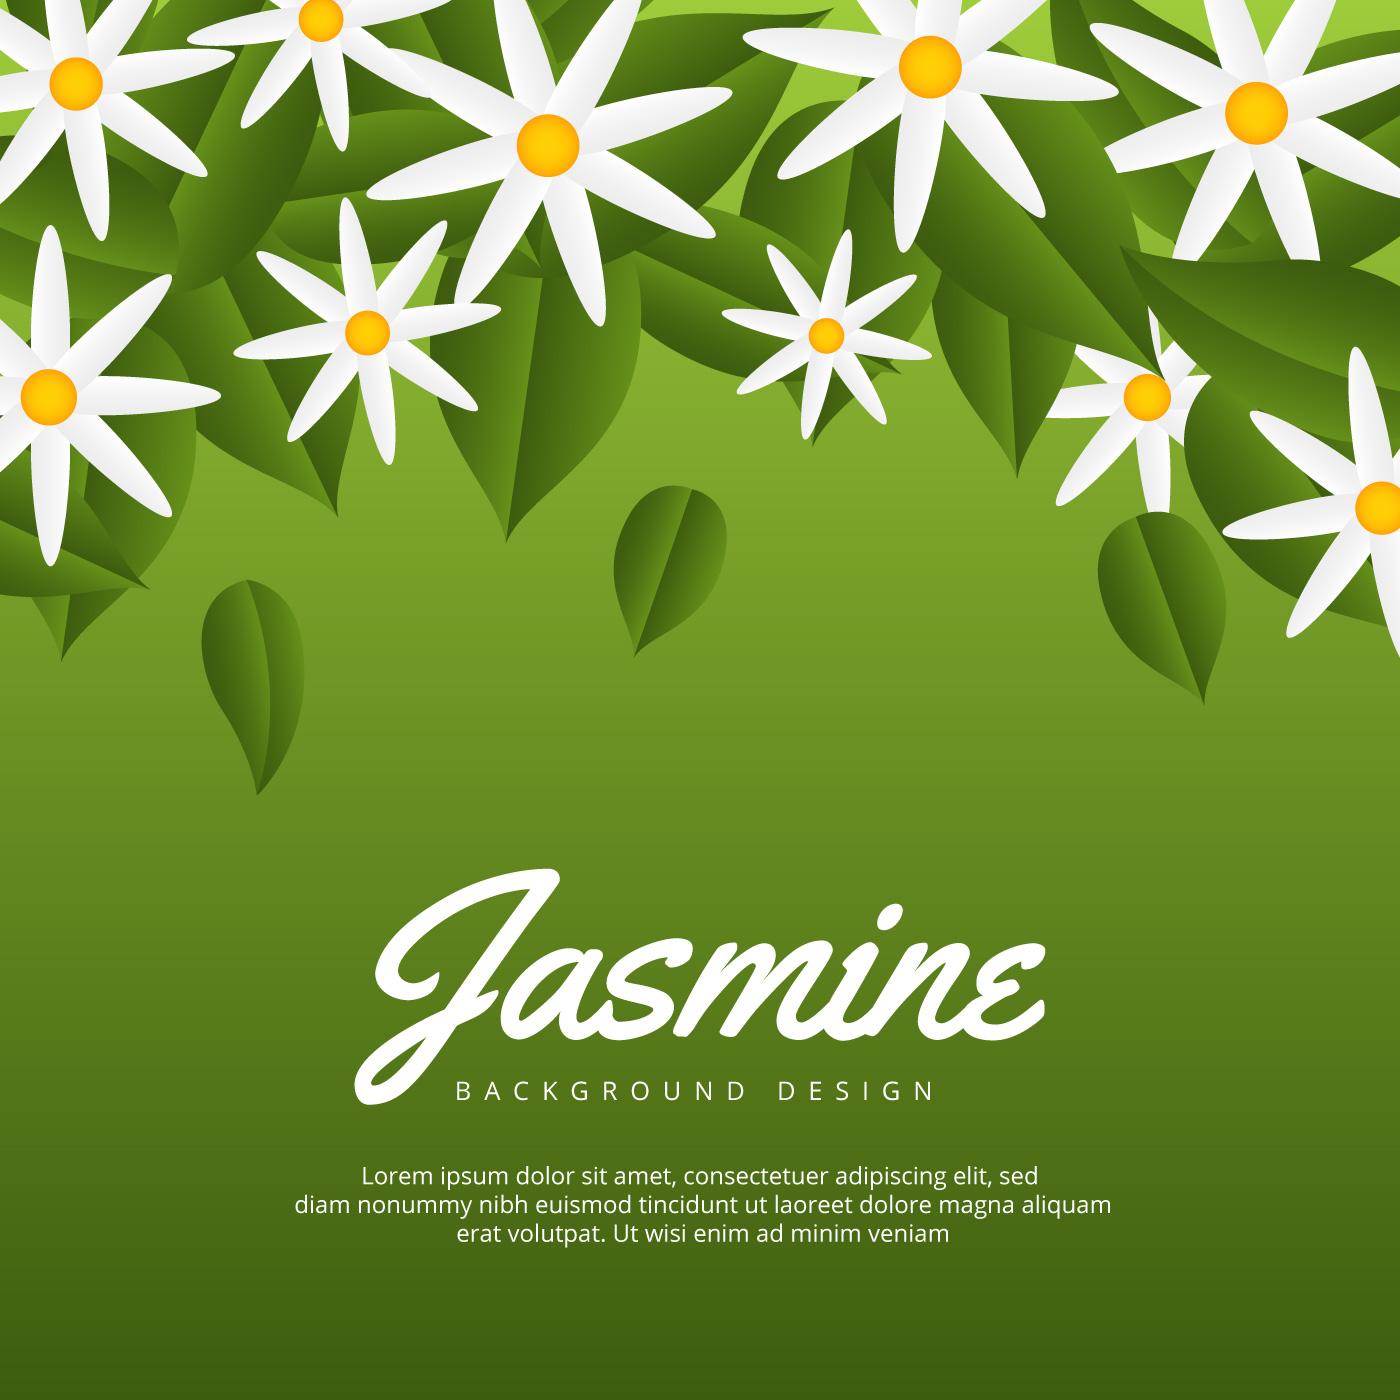 Jasmine Flower Background Download Free Vector Art Stock Graphics